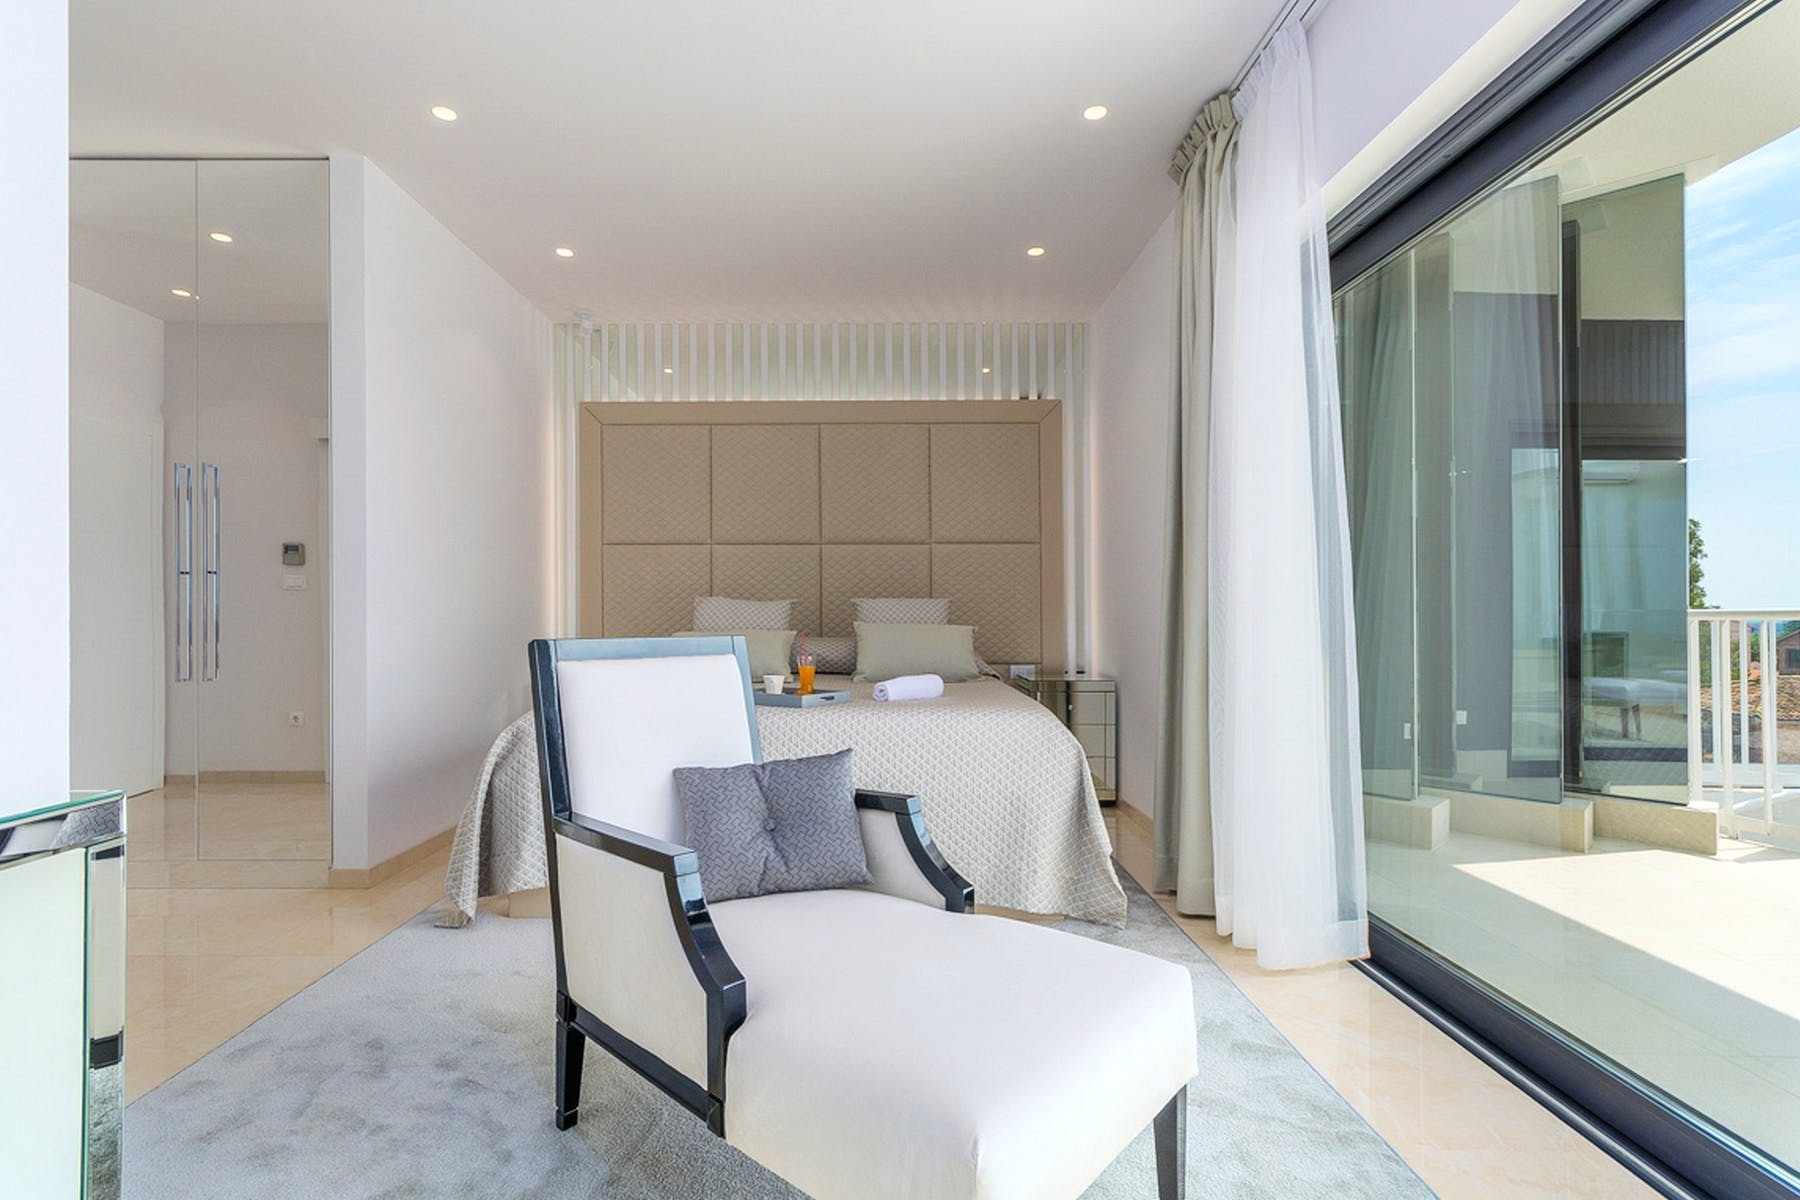 Spavaća soba s pogledom na more